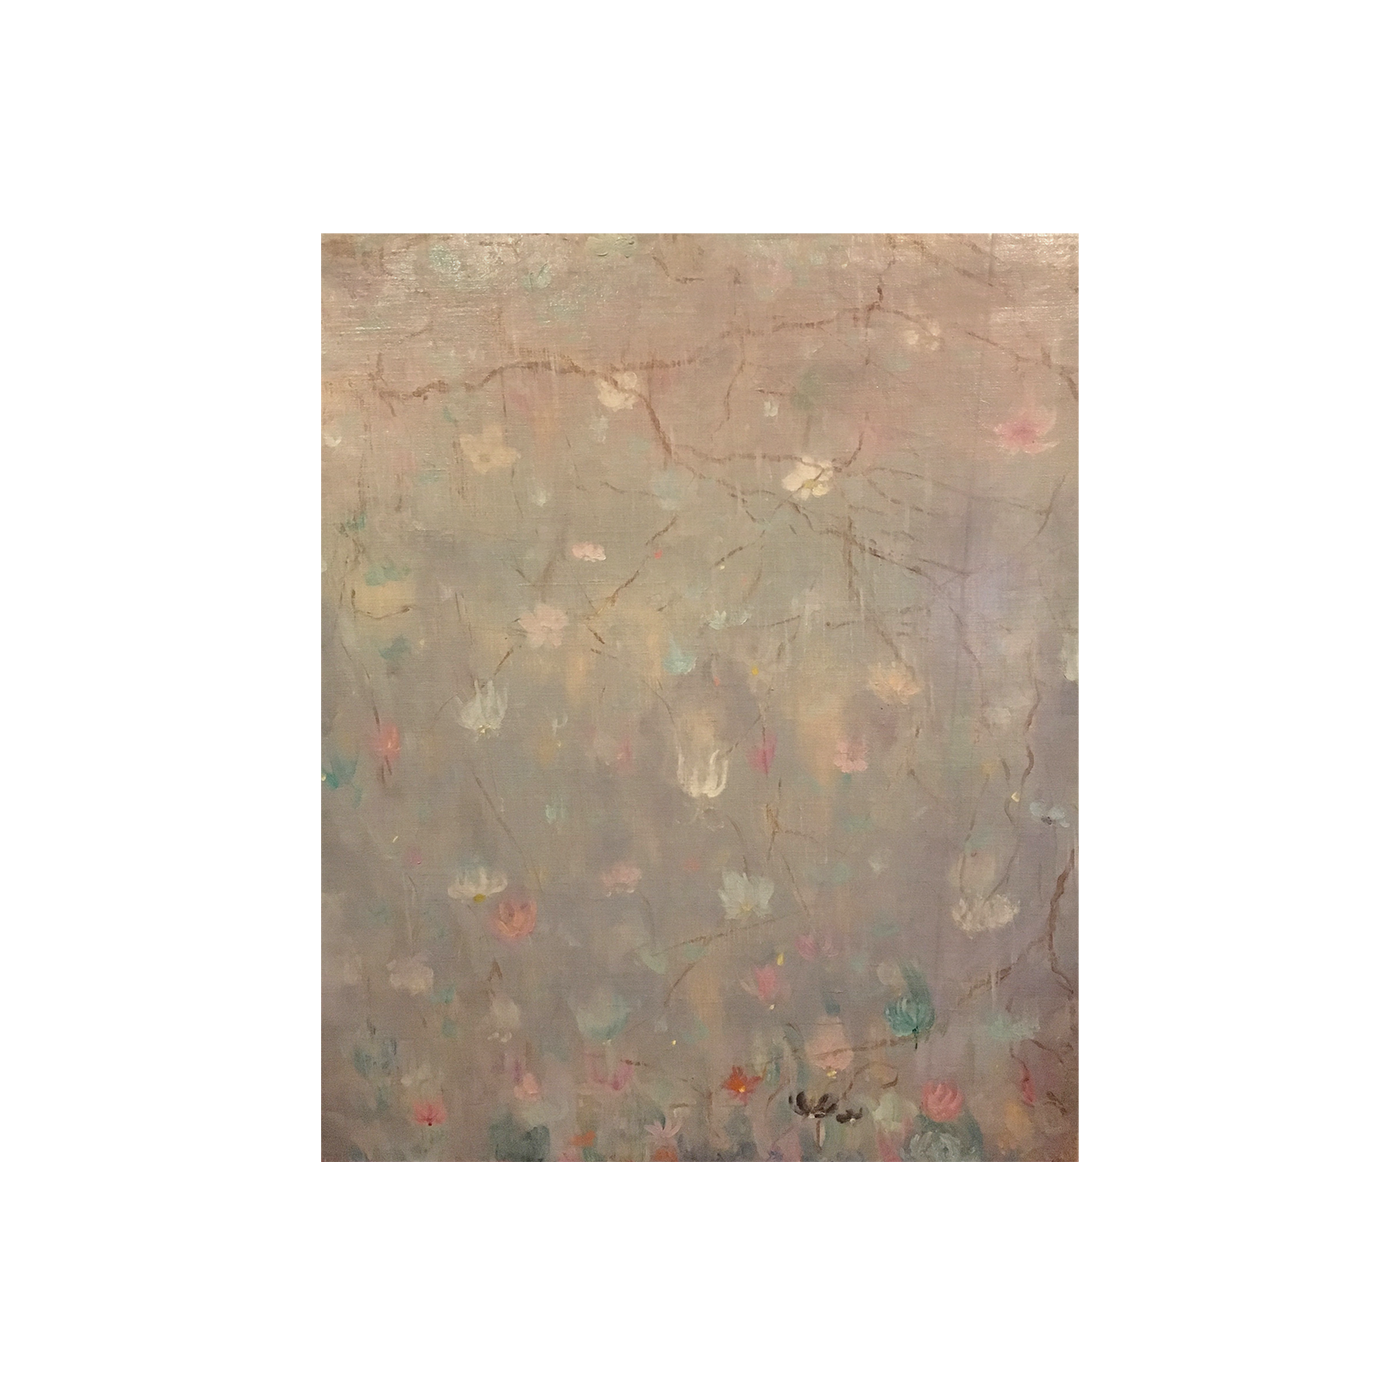 "Glenn Stuart Pearce [1909-1986] American Impressionist painting "" Cherry blossoms"" 1930"